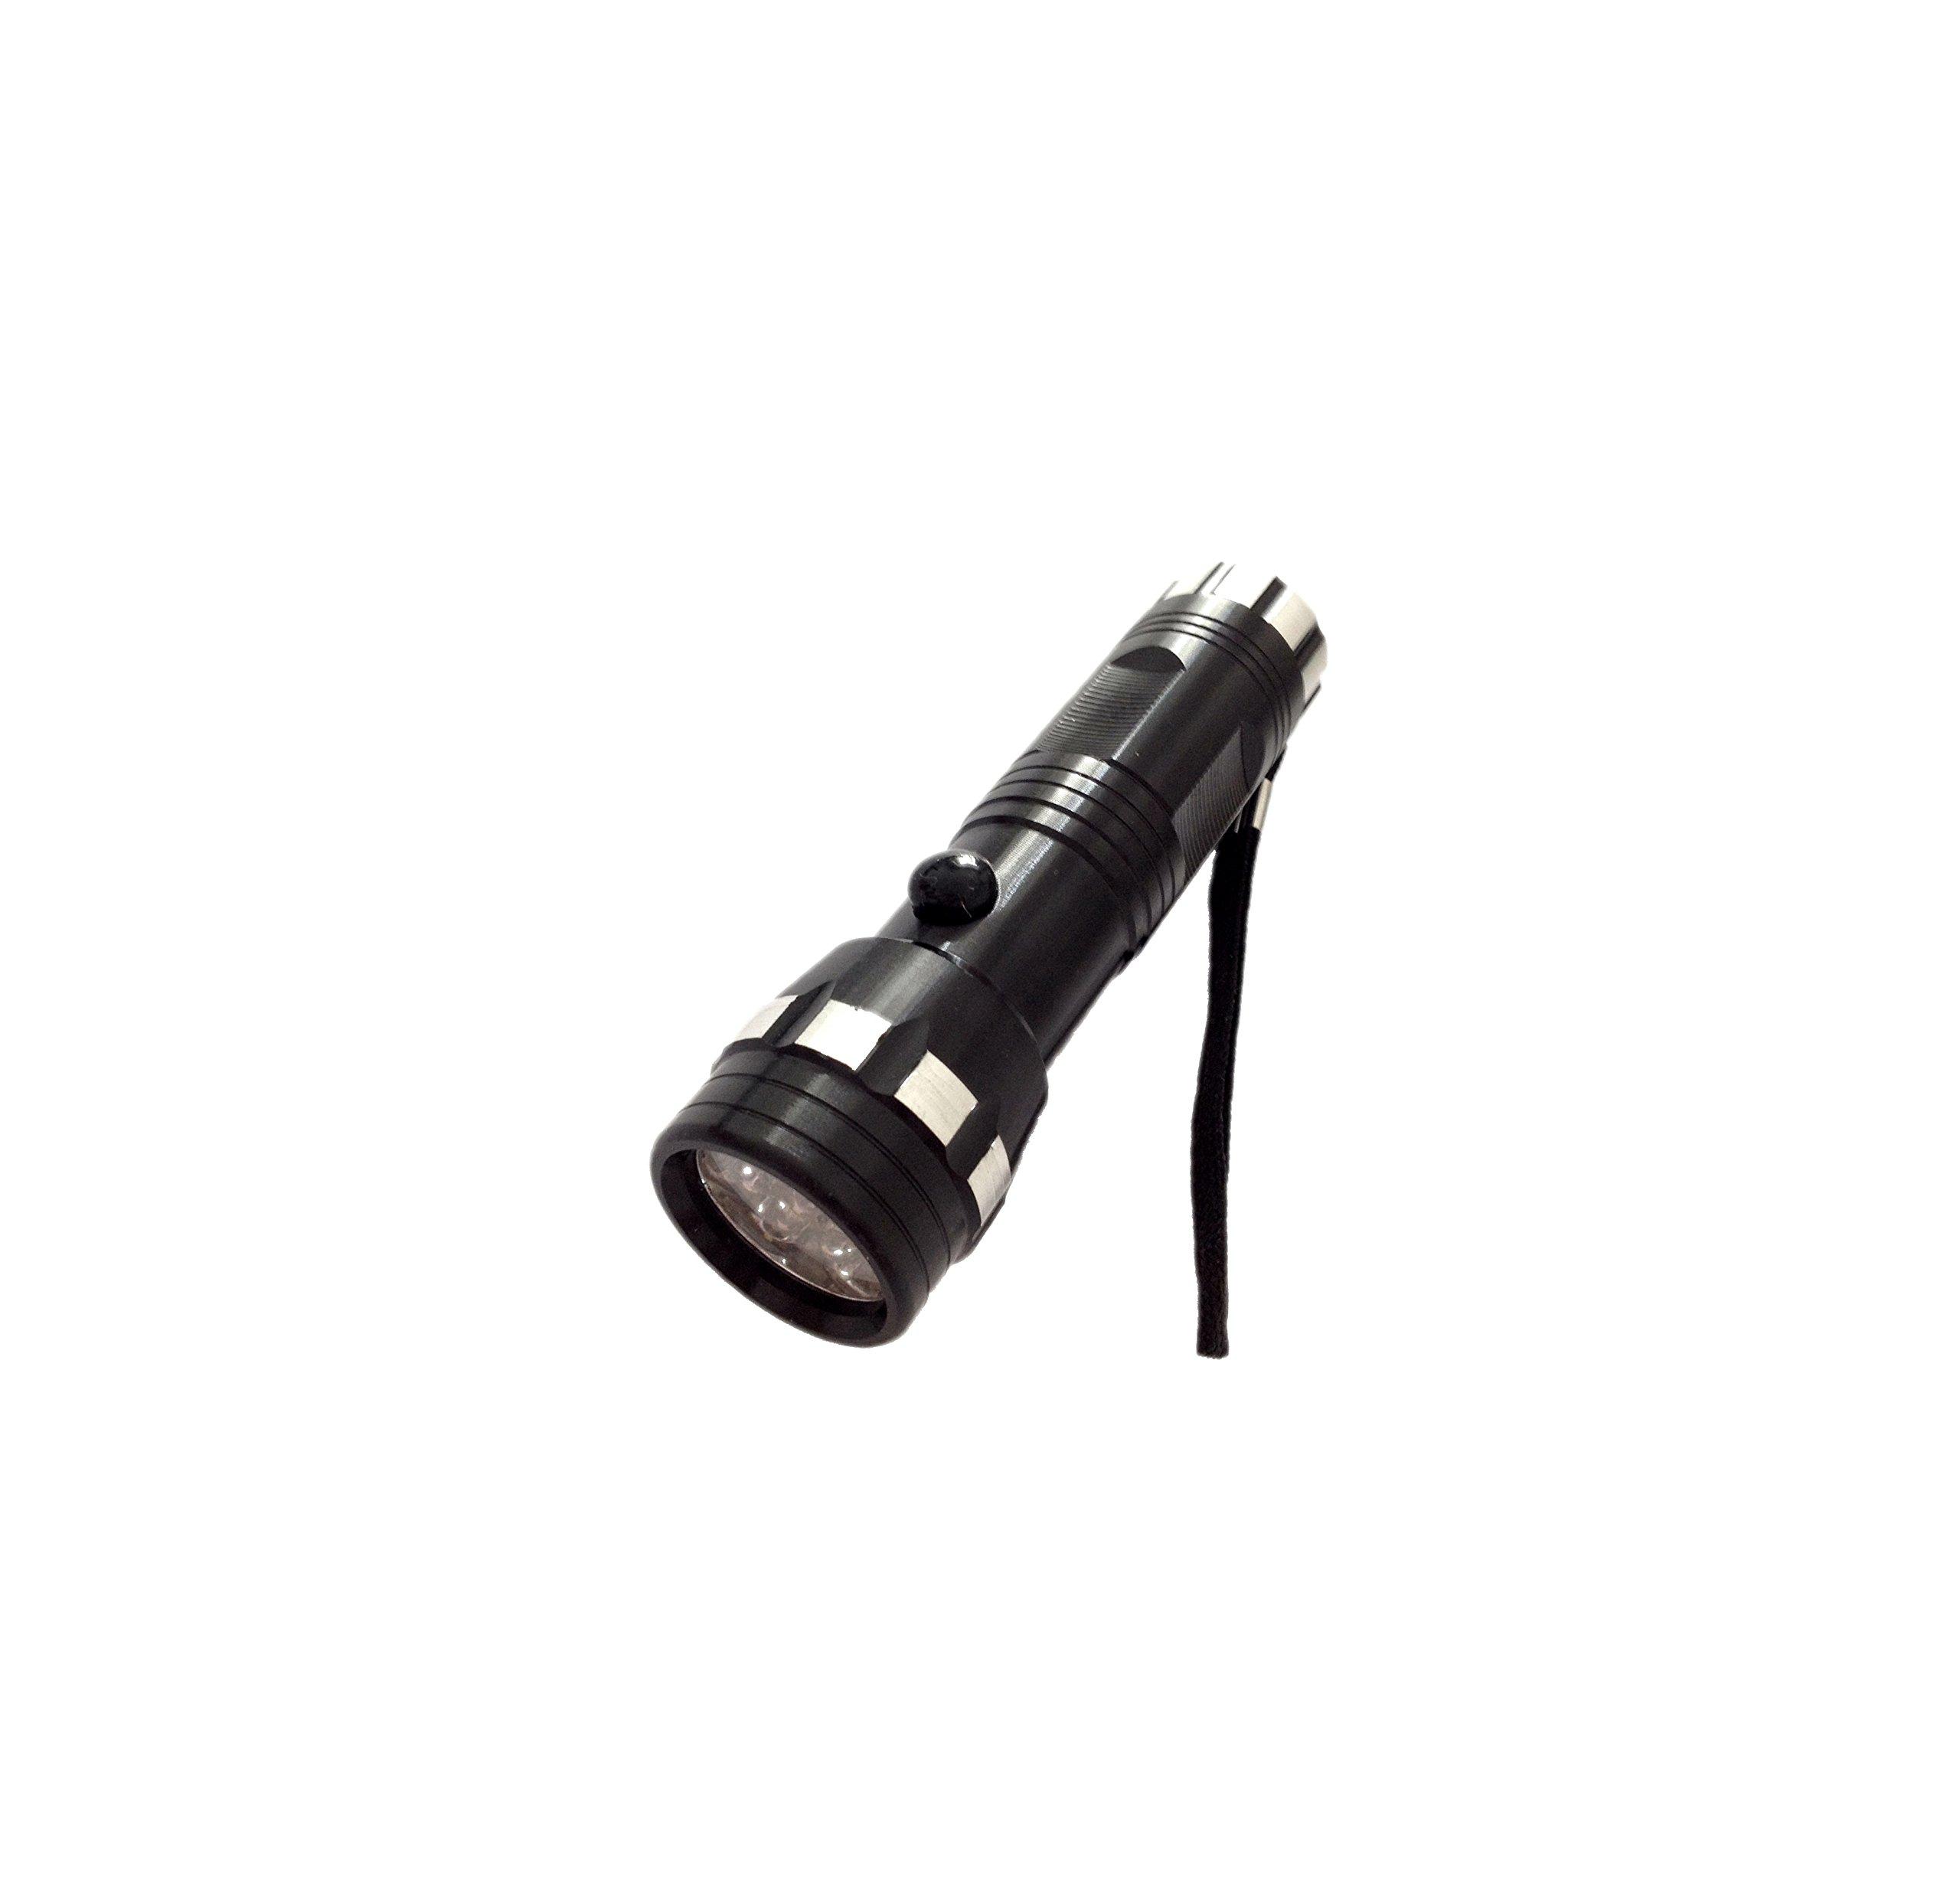 375nm-380nm UV Flashlight with SuperMax-14LEDs,Bulb Life:100,000 Hours,handheld counterfeit detector,UV banknote detectoe,forensic UV light.